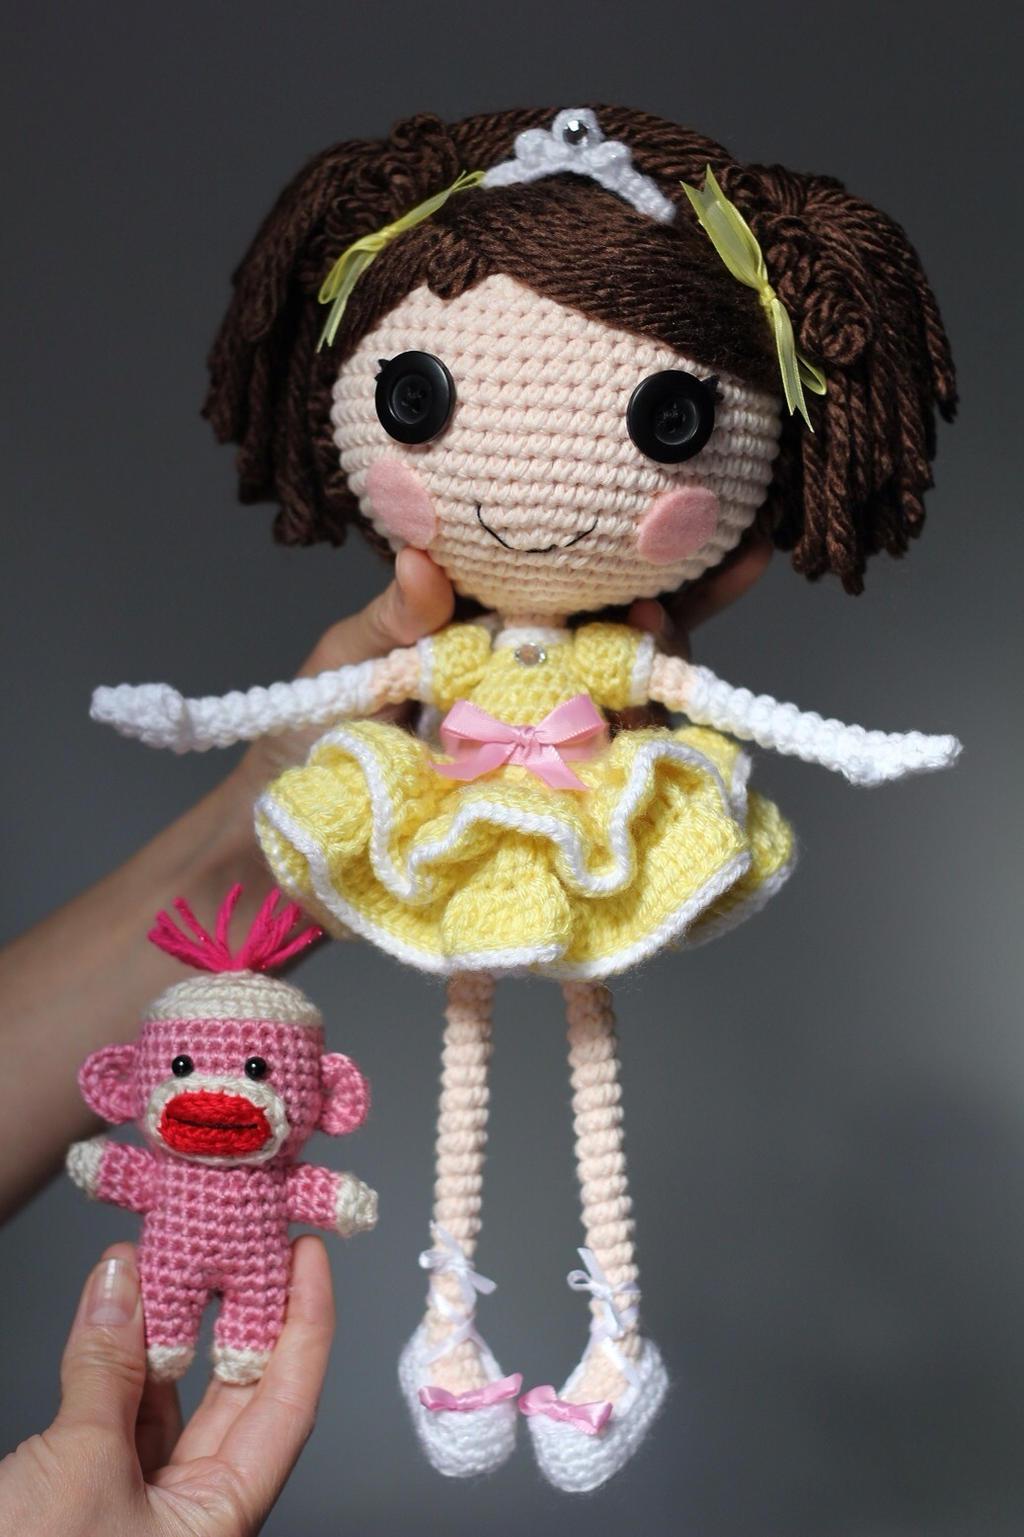 Amigurumi Forum : Lalaloopsy oc crochet amigurumi doll by npantz on deviantart